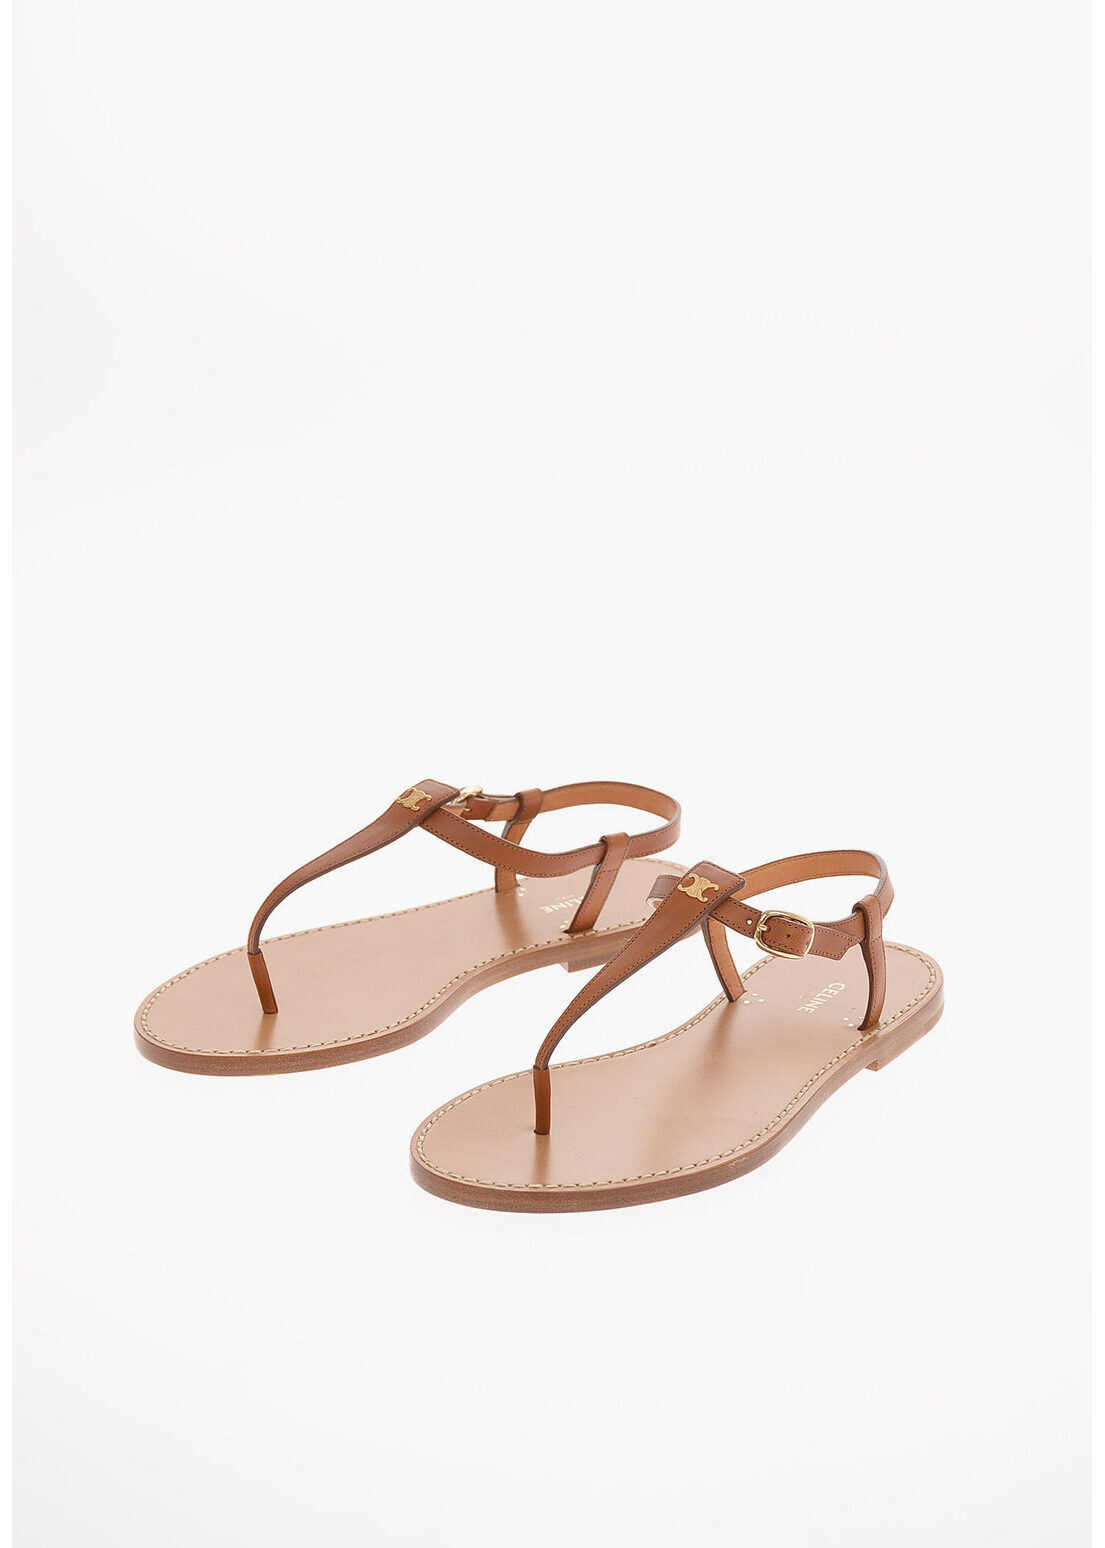 Céline Leather Thong Sandals BROWN imagine b-mall.ro